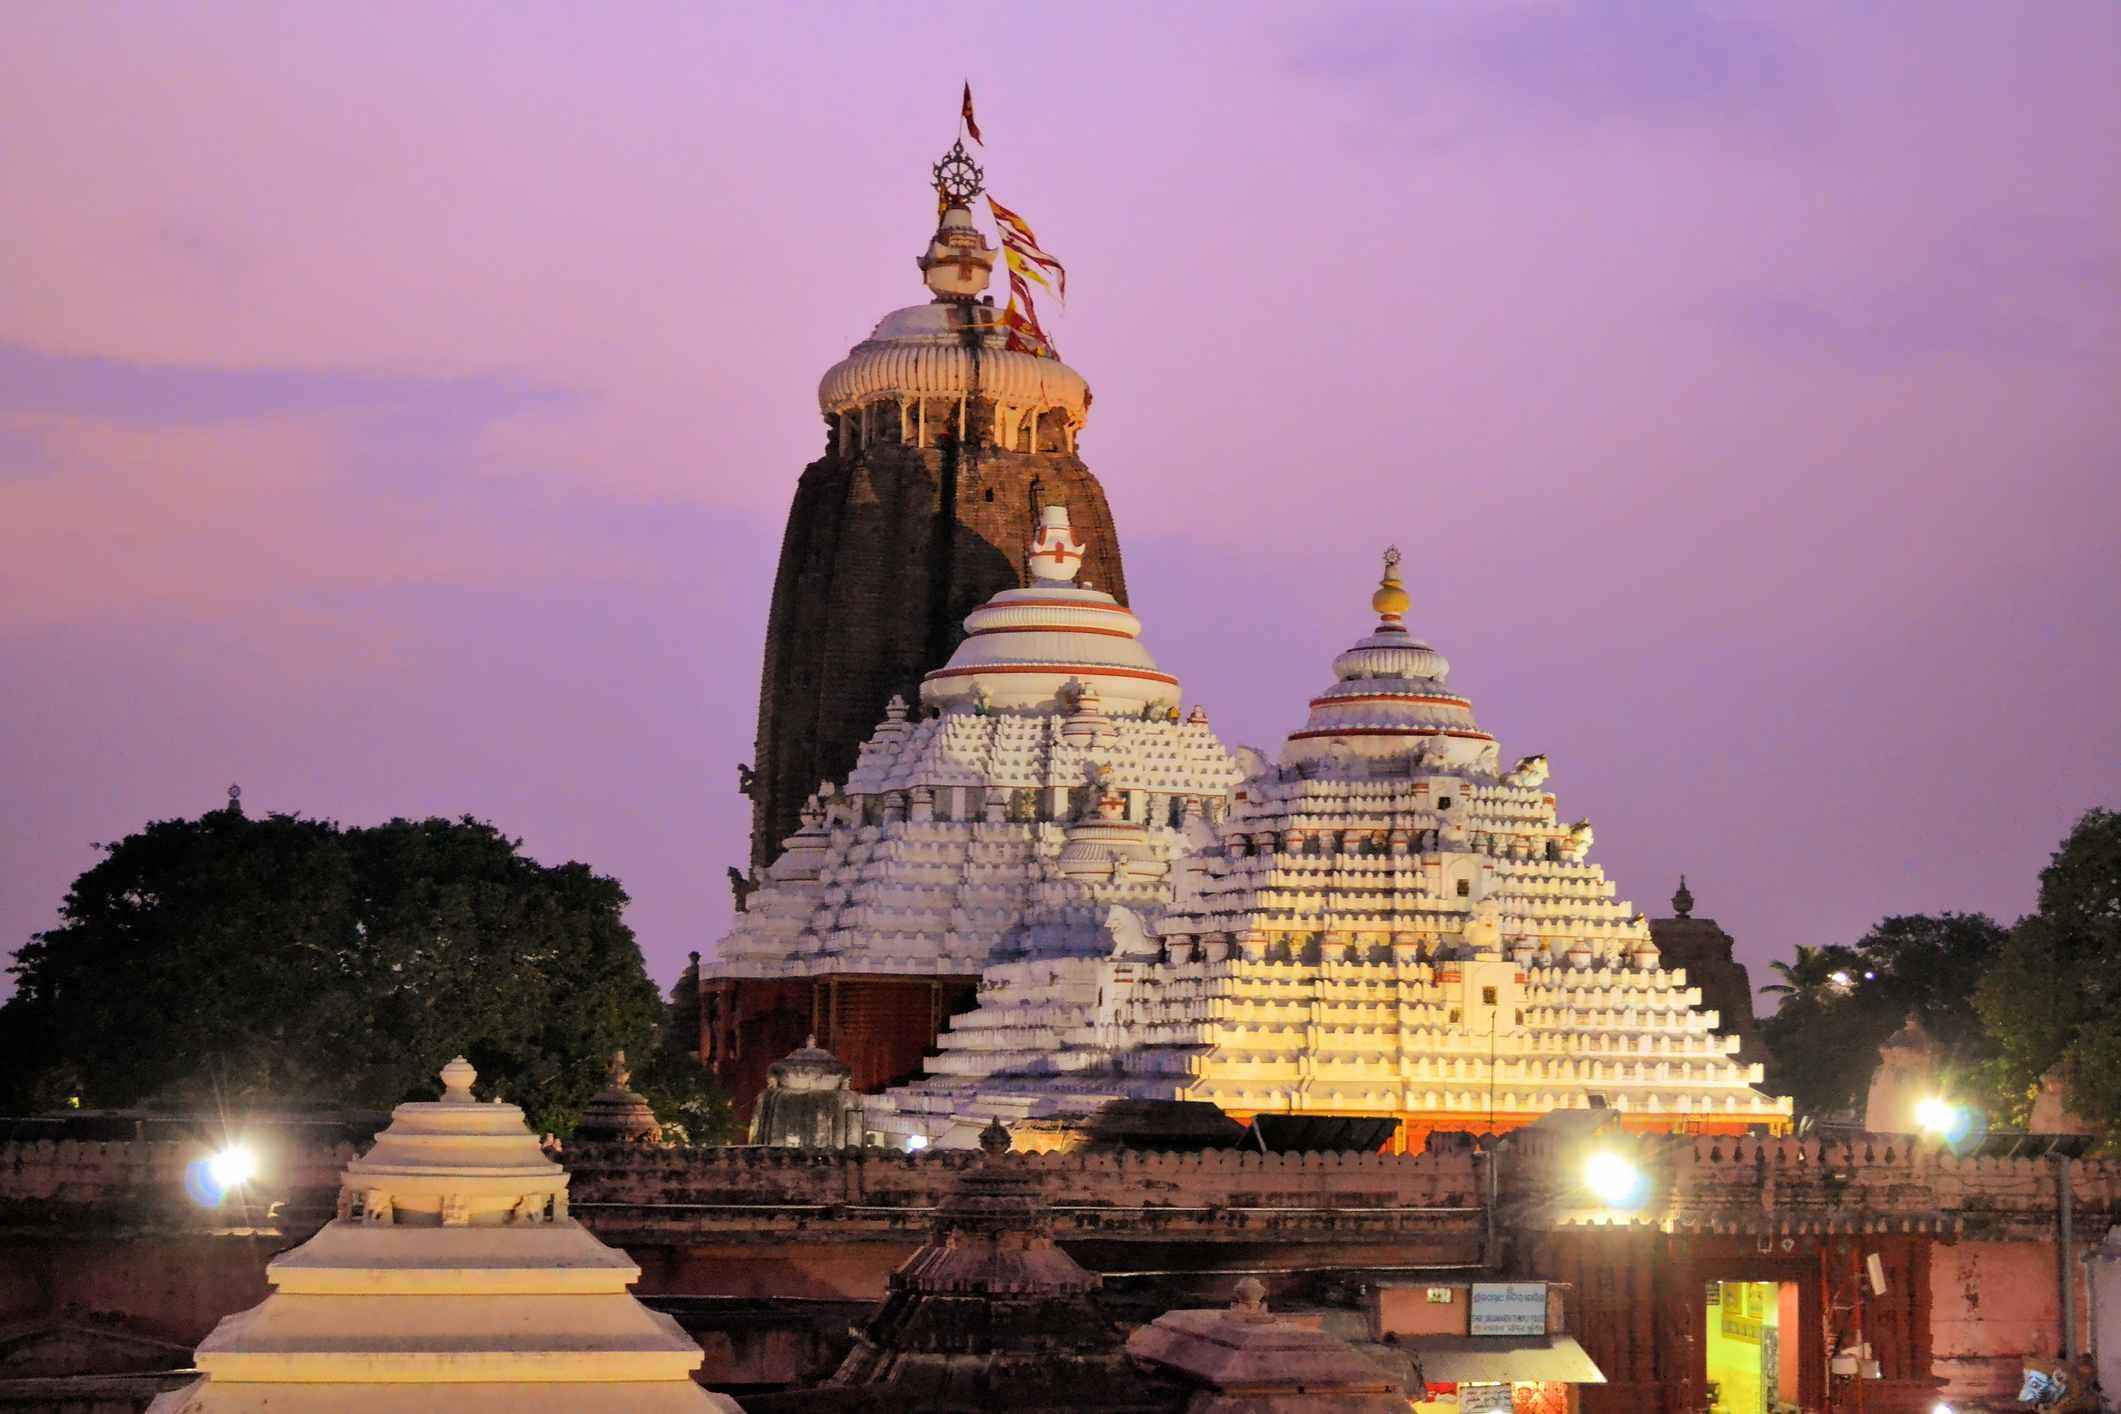 The city of Puri